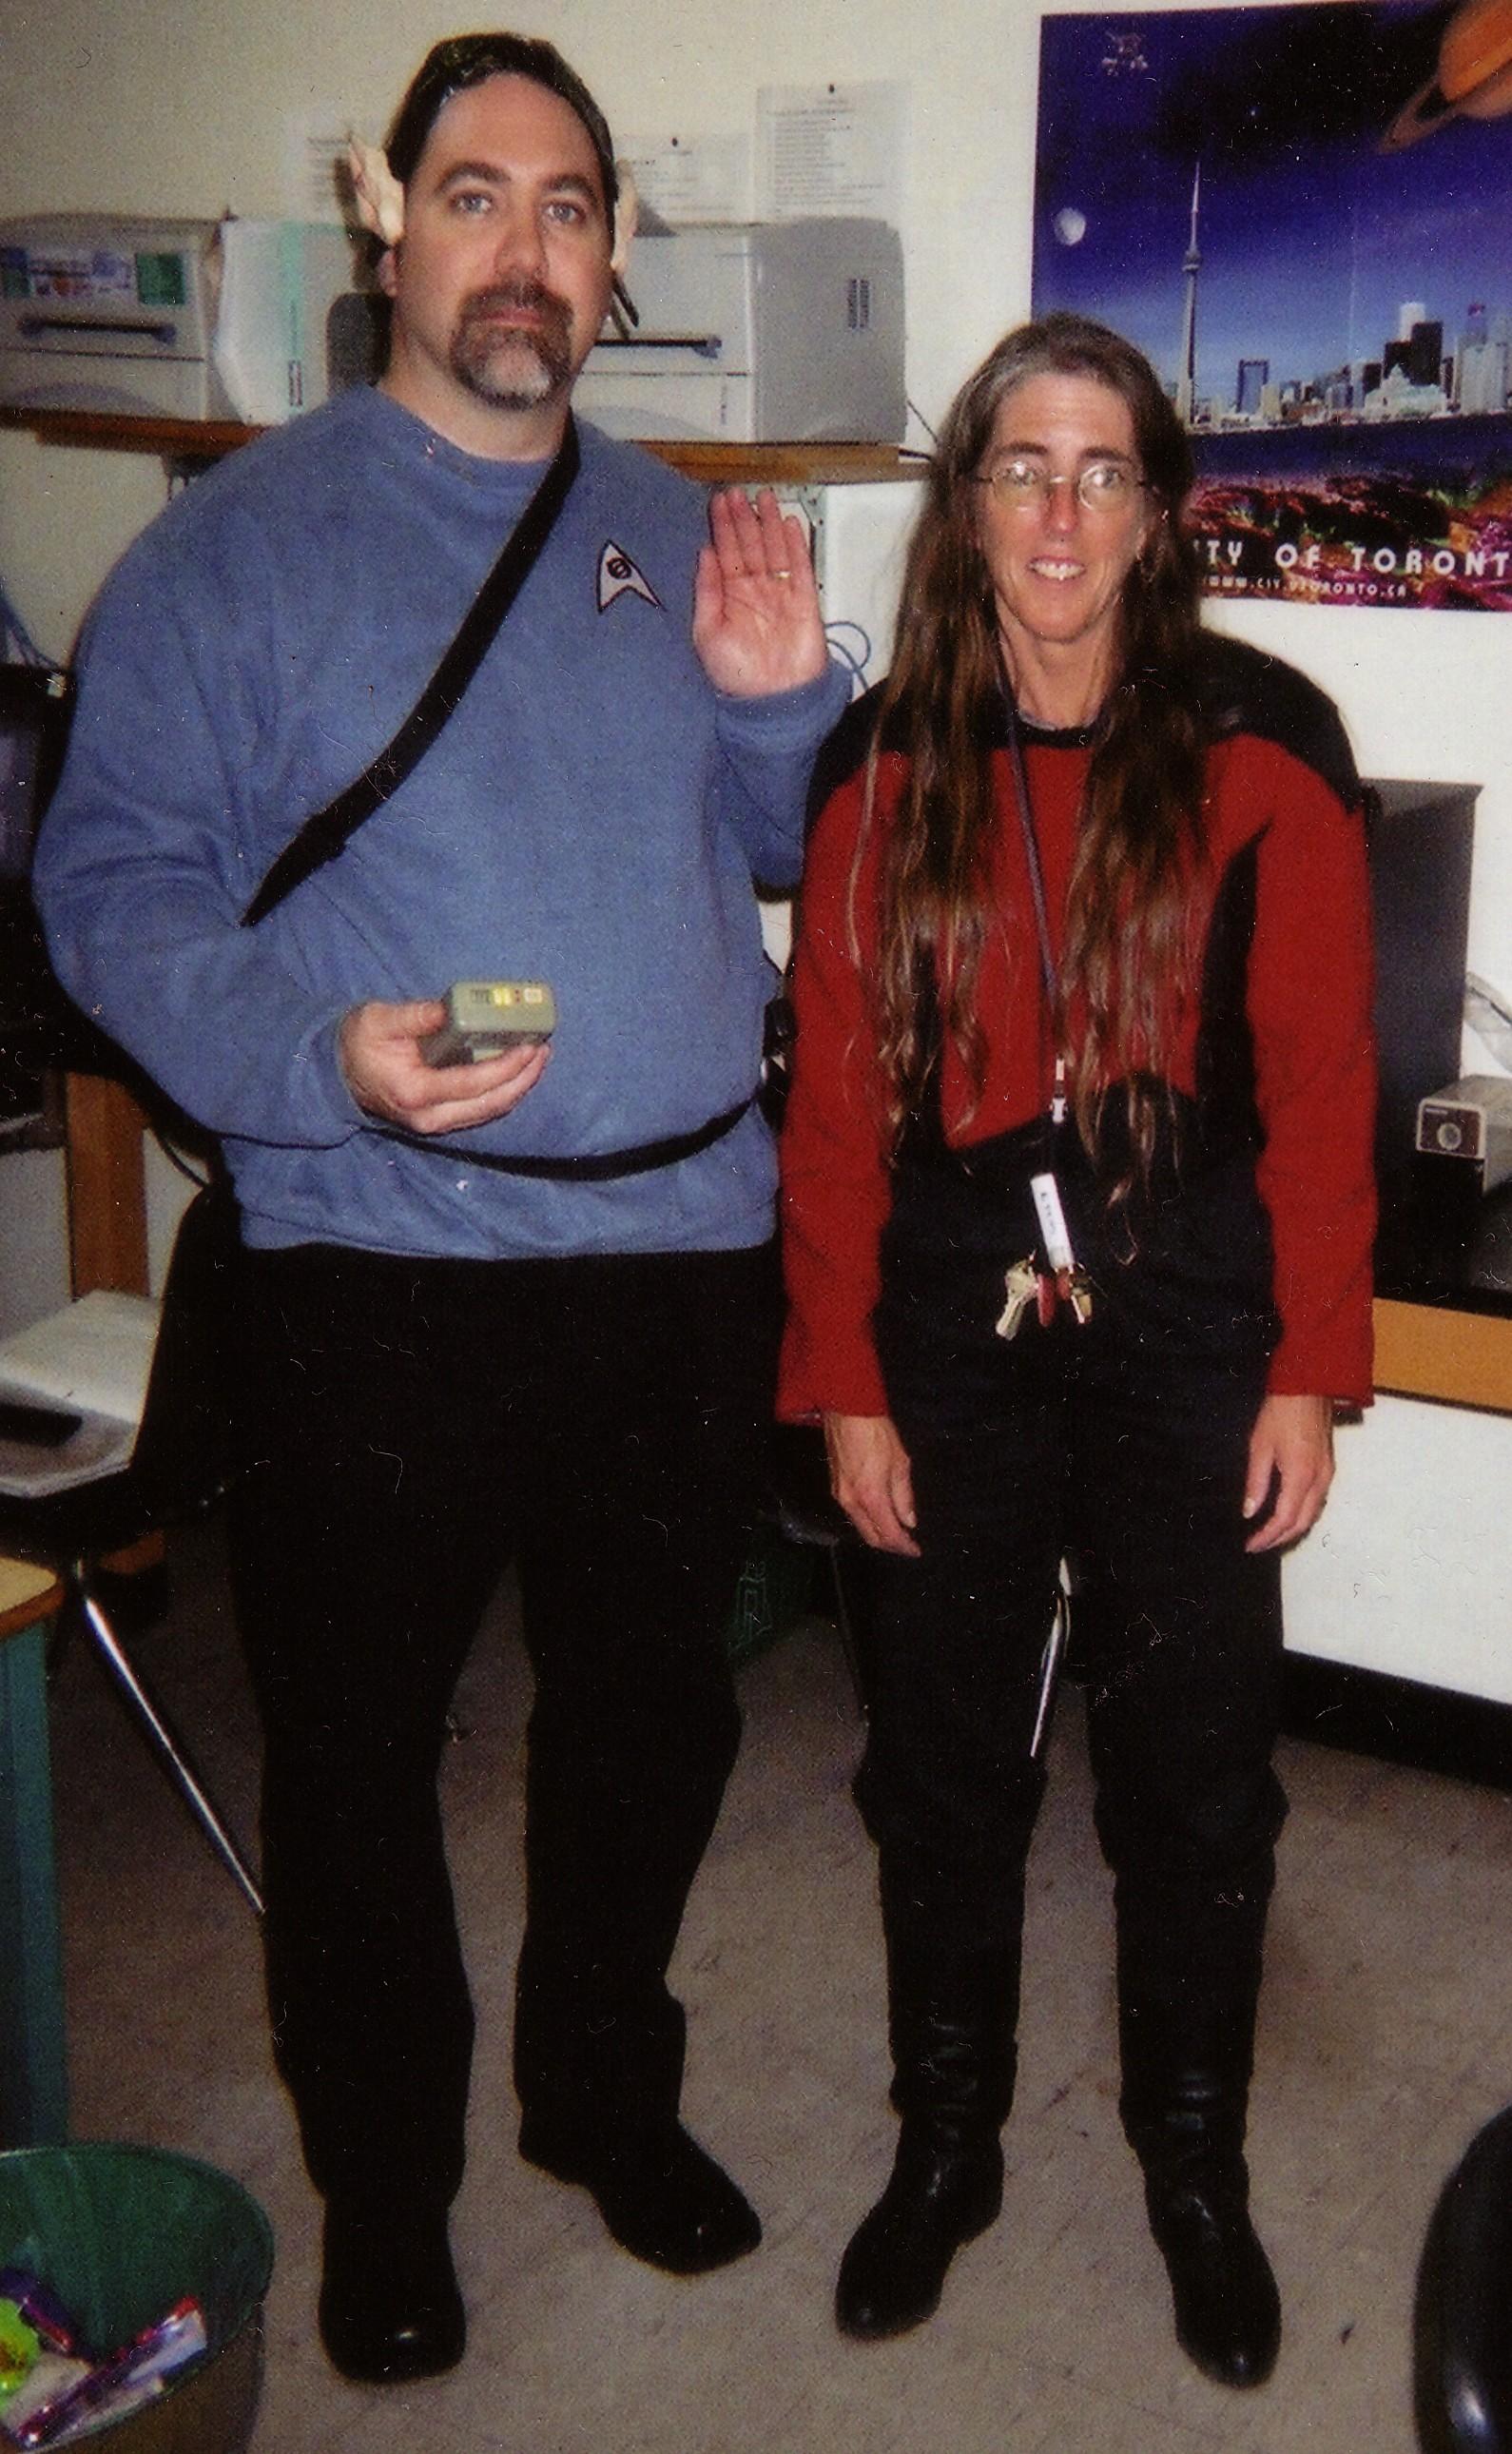 Star Trek convention habitues